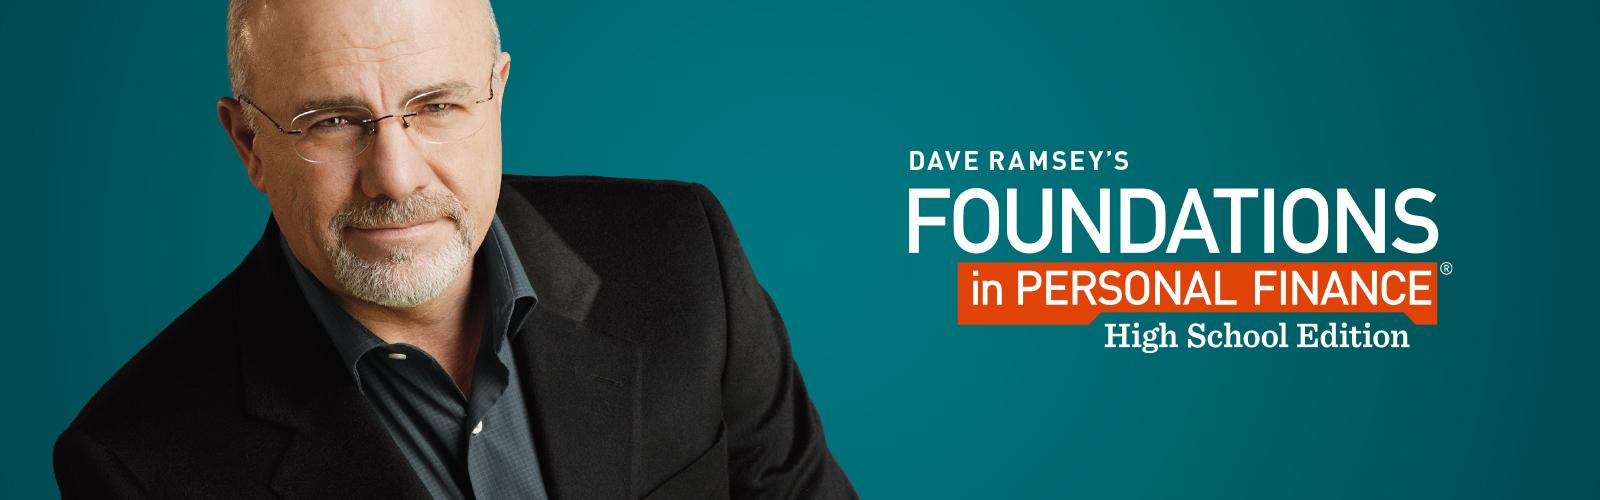 Dave Ramsey